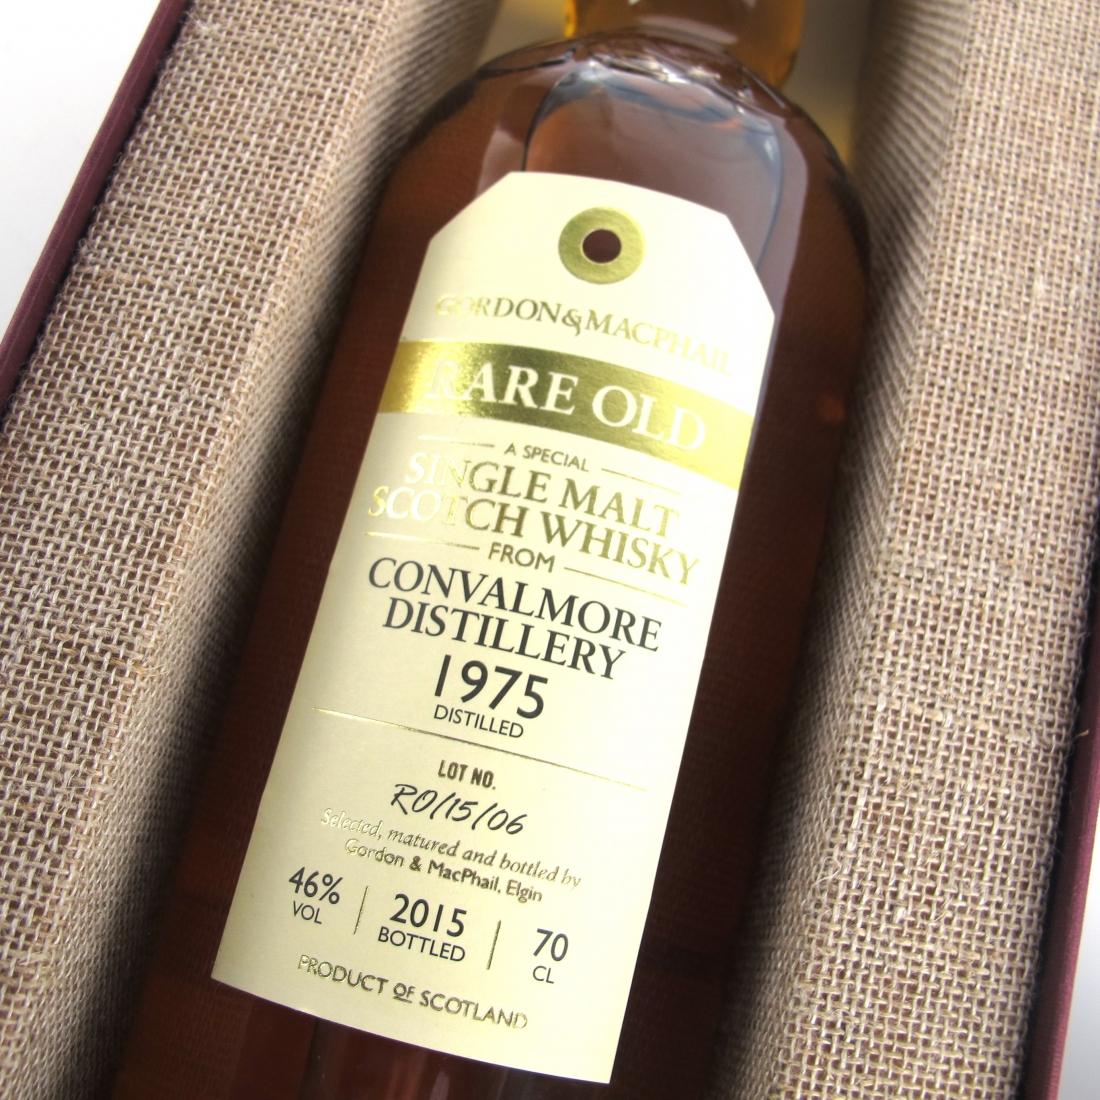 Convalmore 1975 Gordon and MacPhail Rare Old